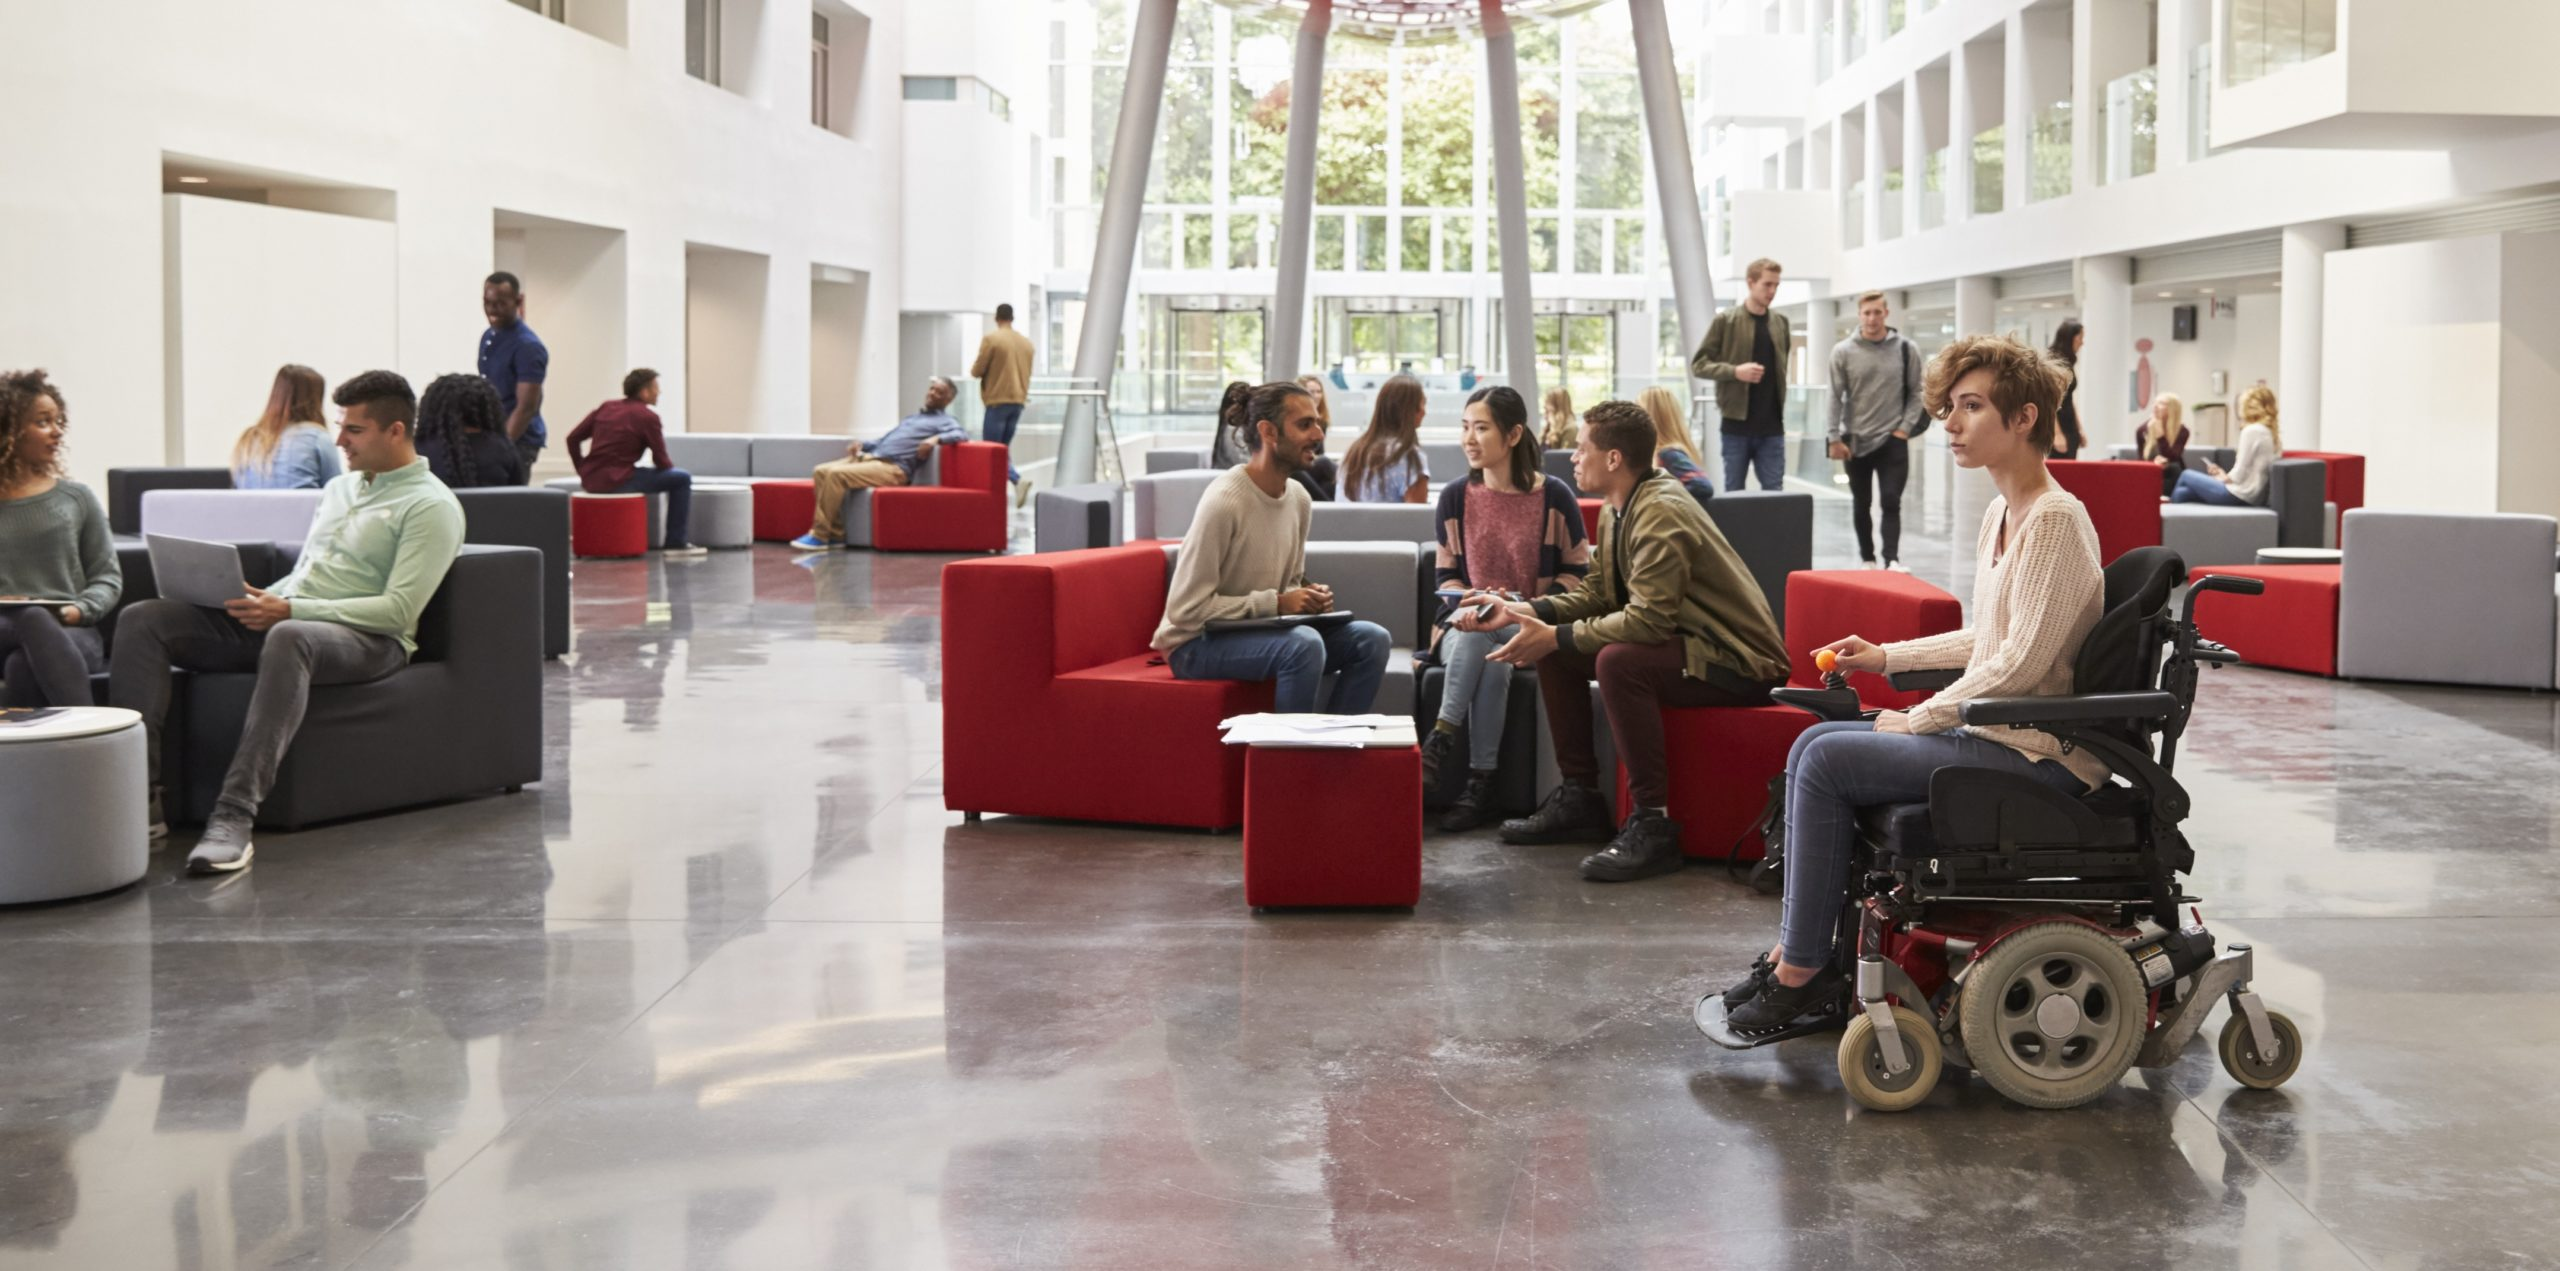 College Student in Wheelchair in Campus Center